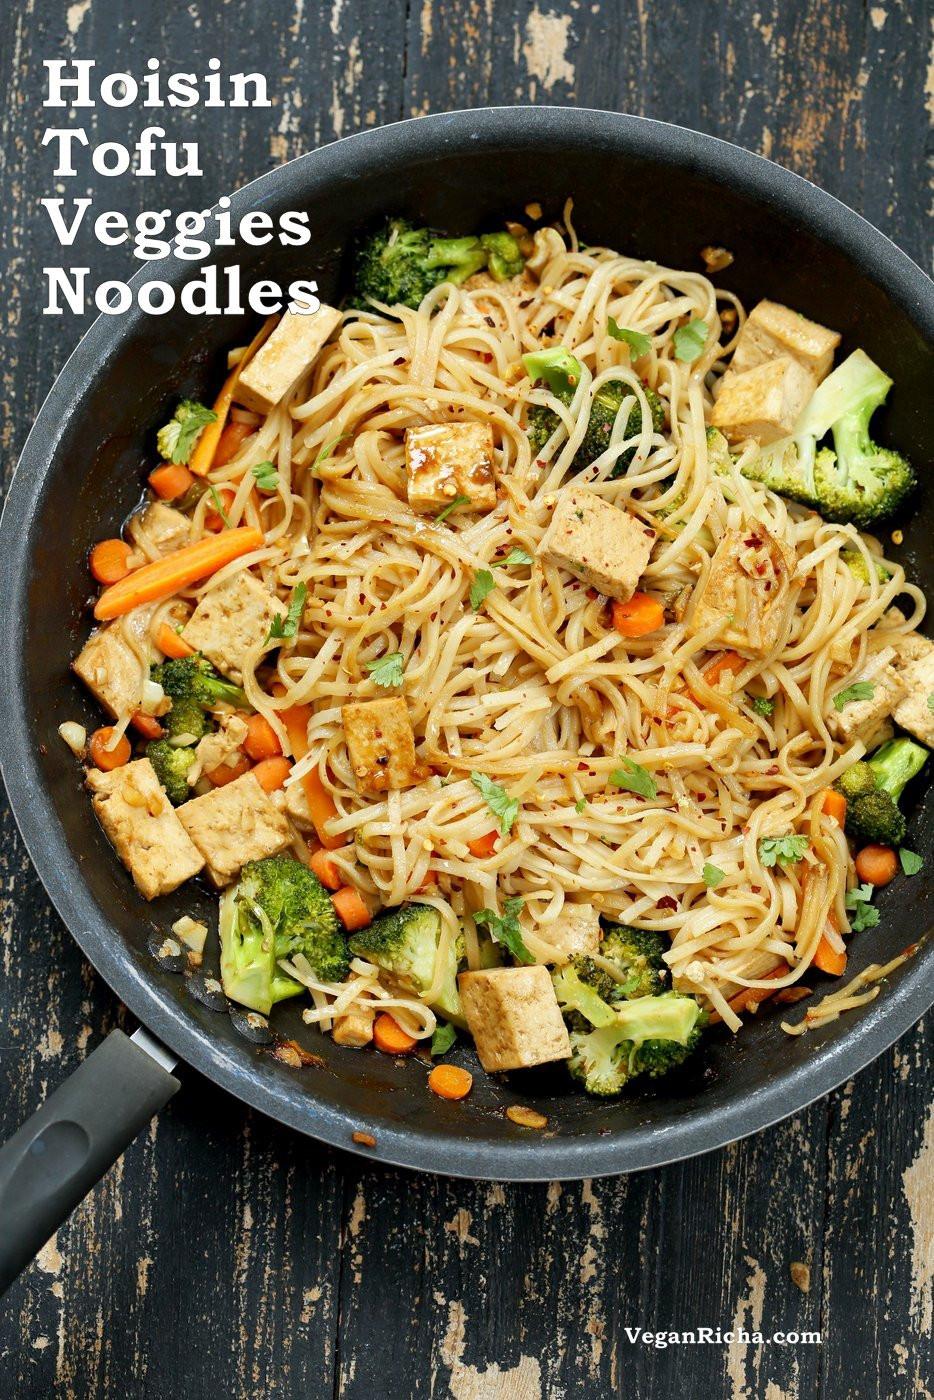 Tofu Sauce Recipes  Tofu and Brown Rice Noodles in Hoisin Sauce Vegan Richa